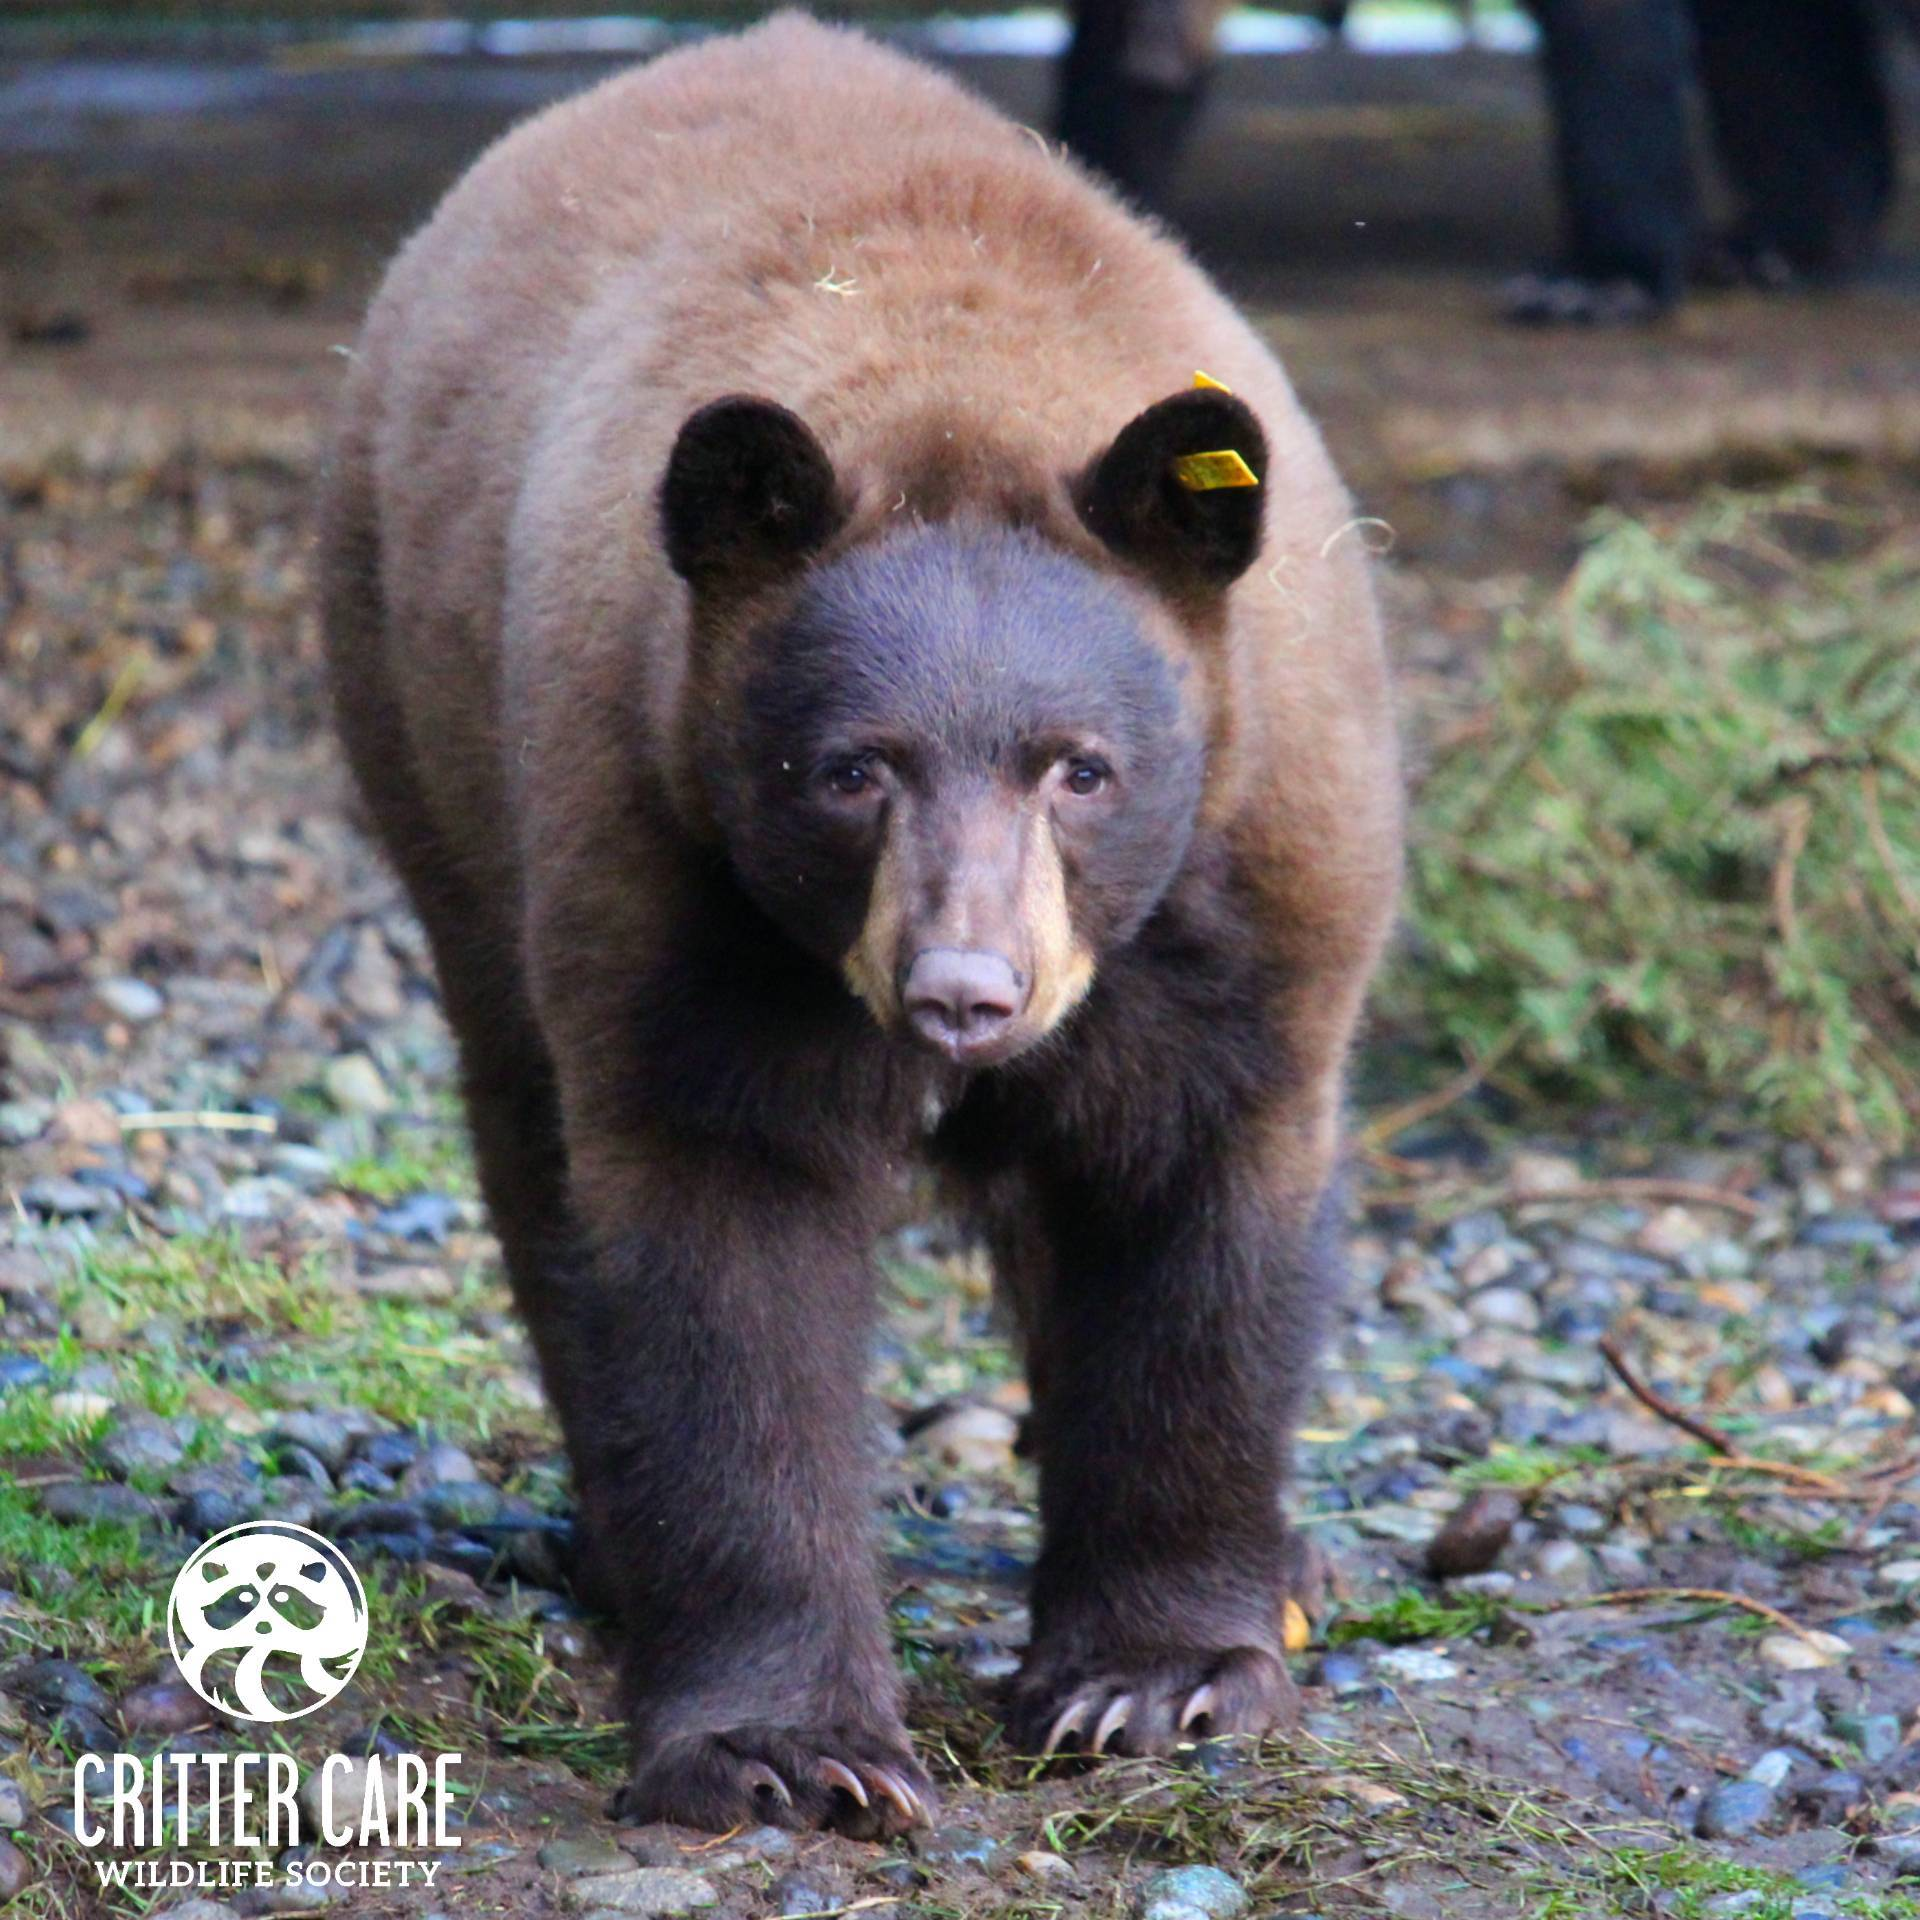 Black bear. (Critter Care Wildlife Society Facebook)